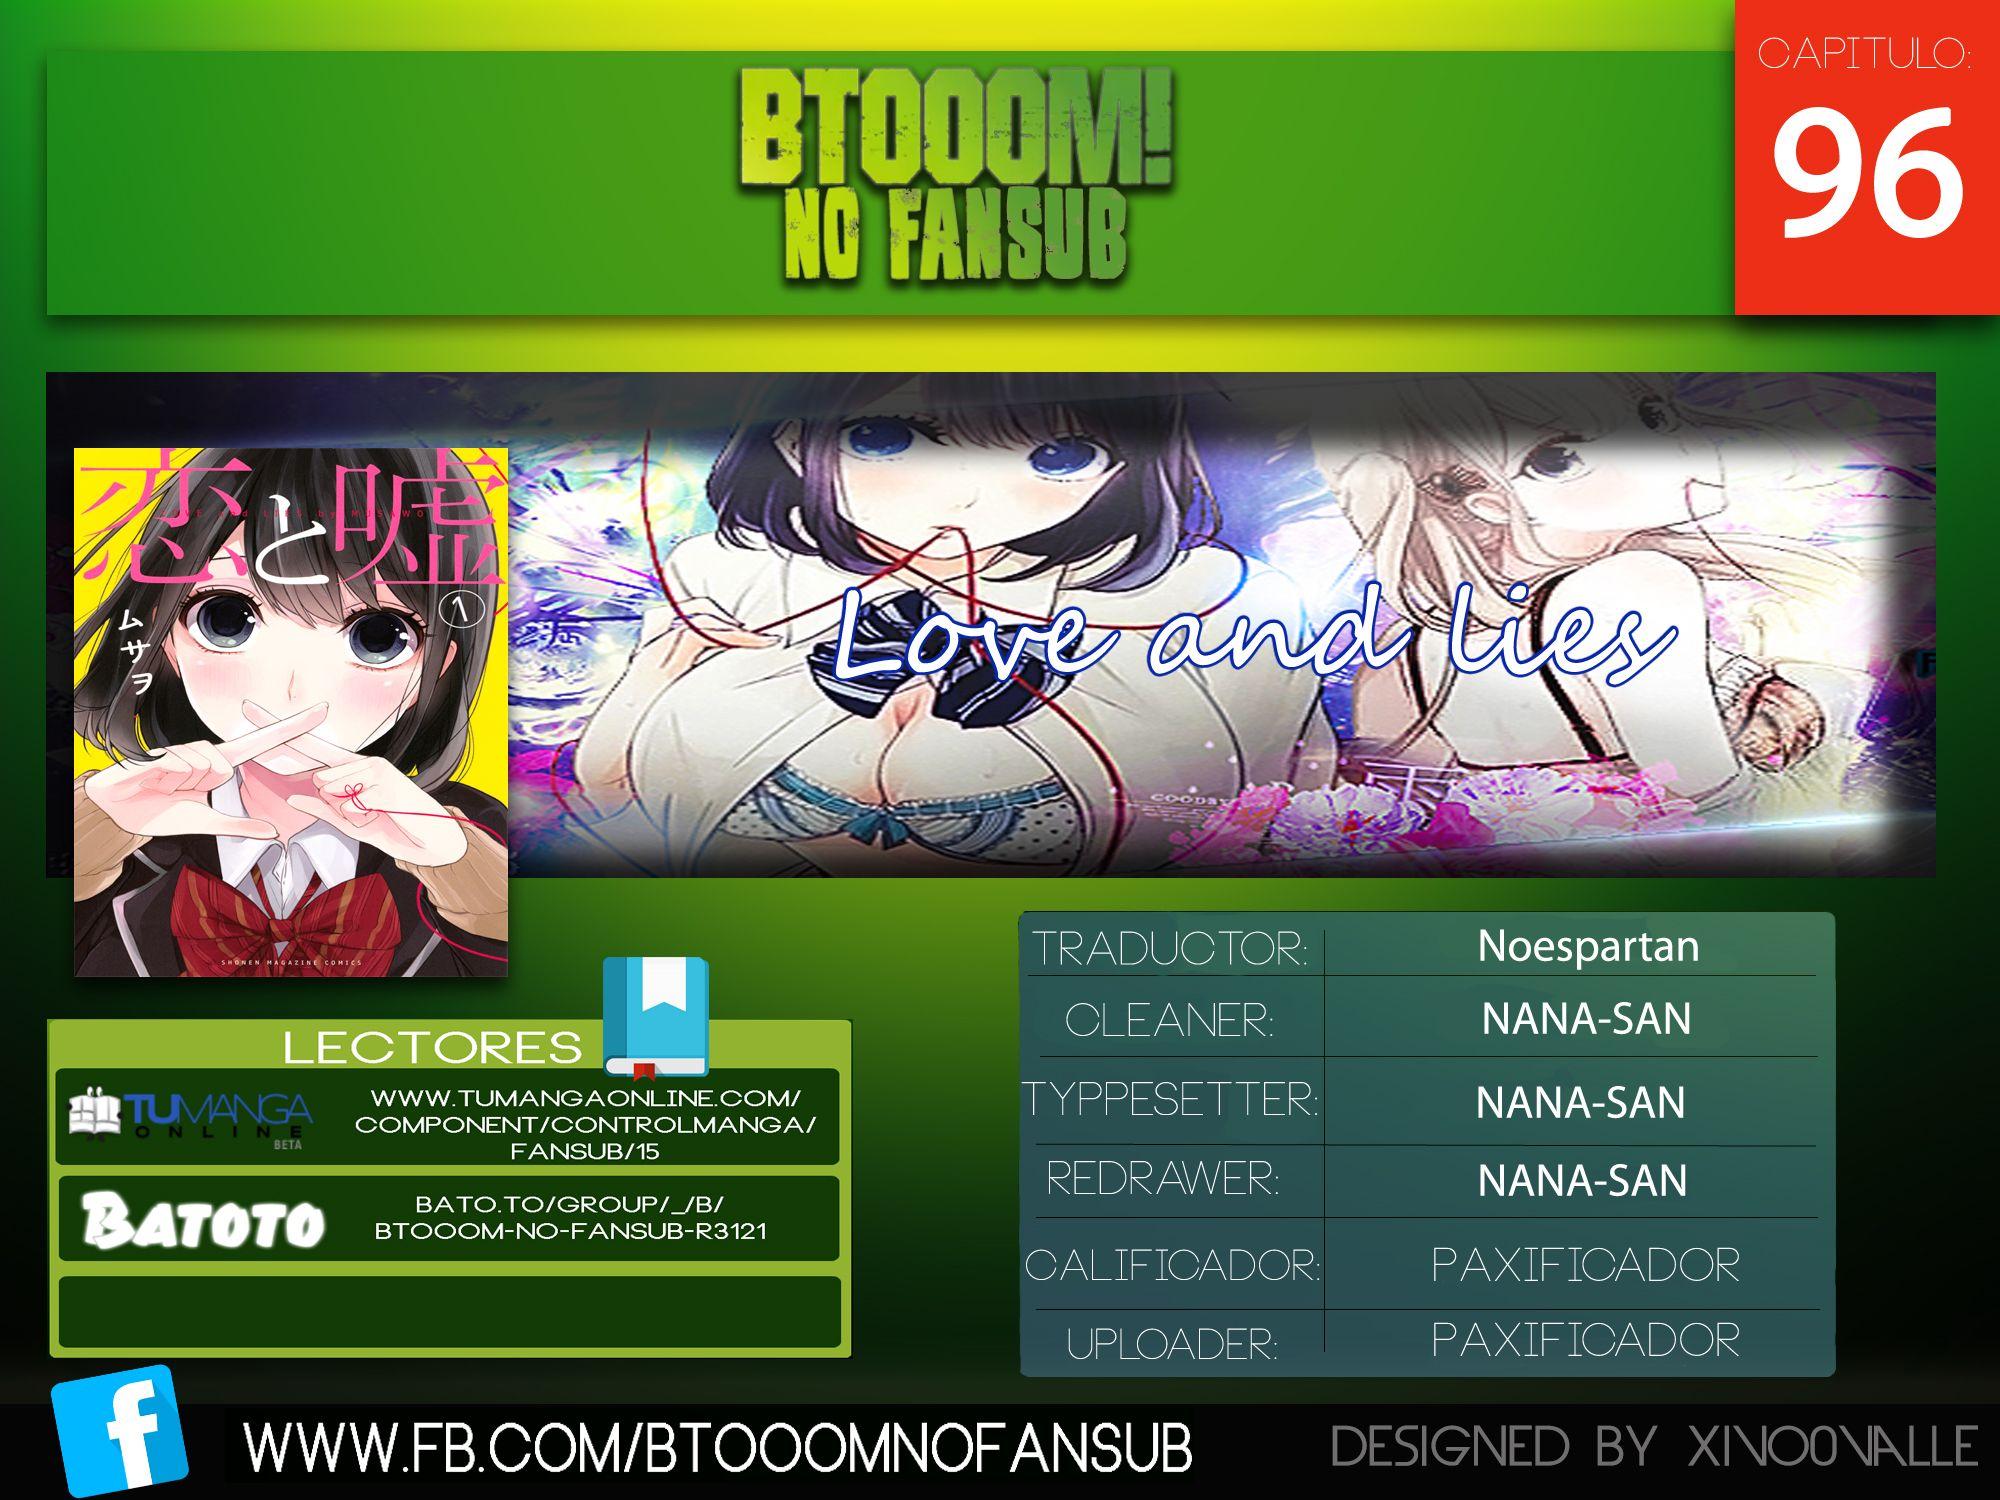 http://c5.ninemanga.com/es_manga/14/14734/484946/ef840e785977965282331cfdb405233c.jpg Page 1